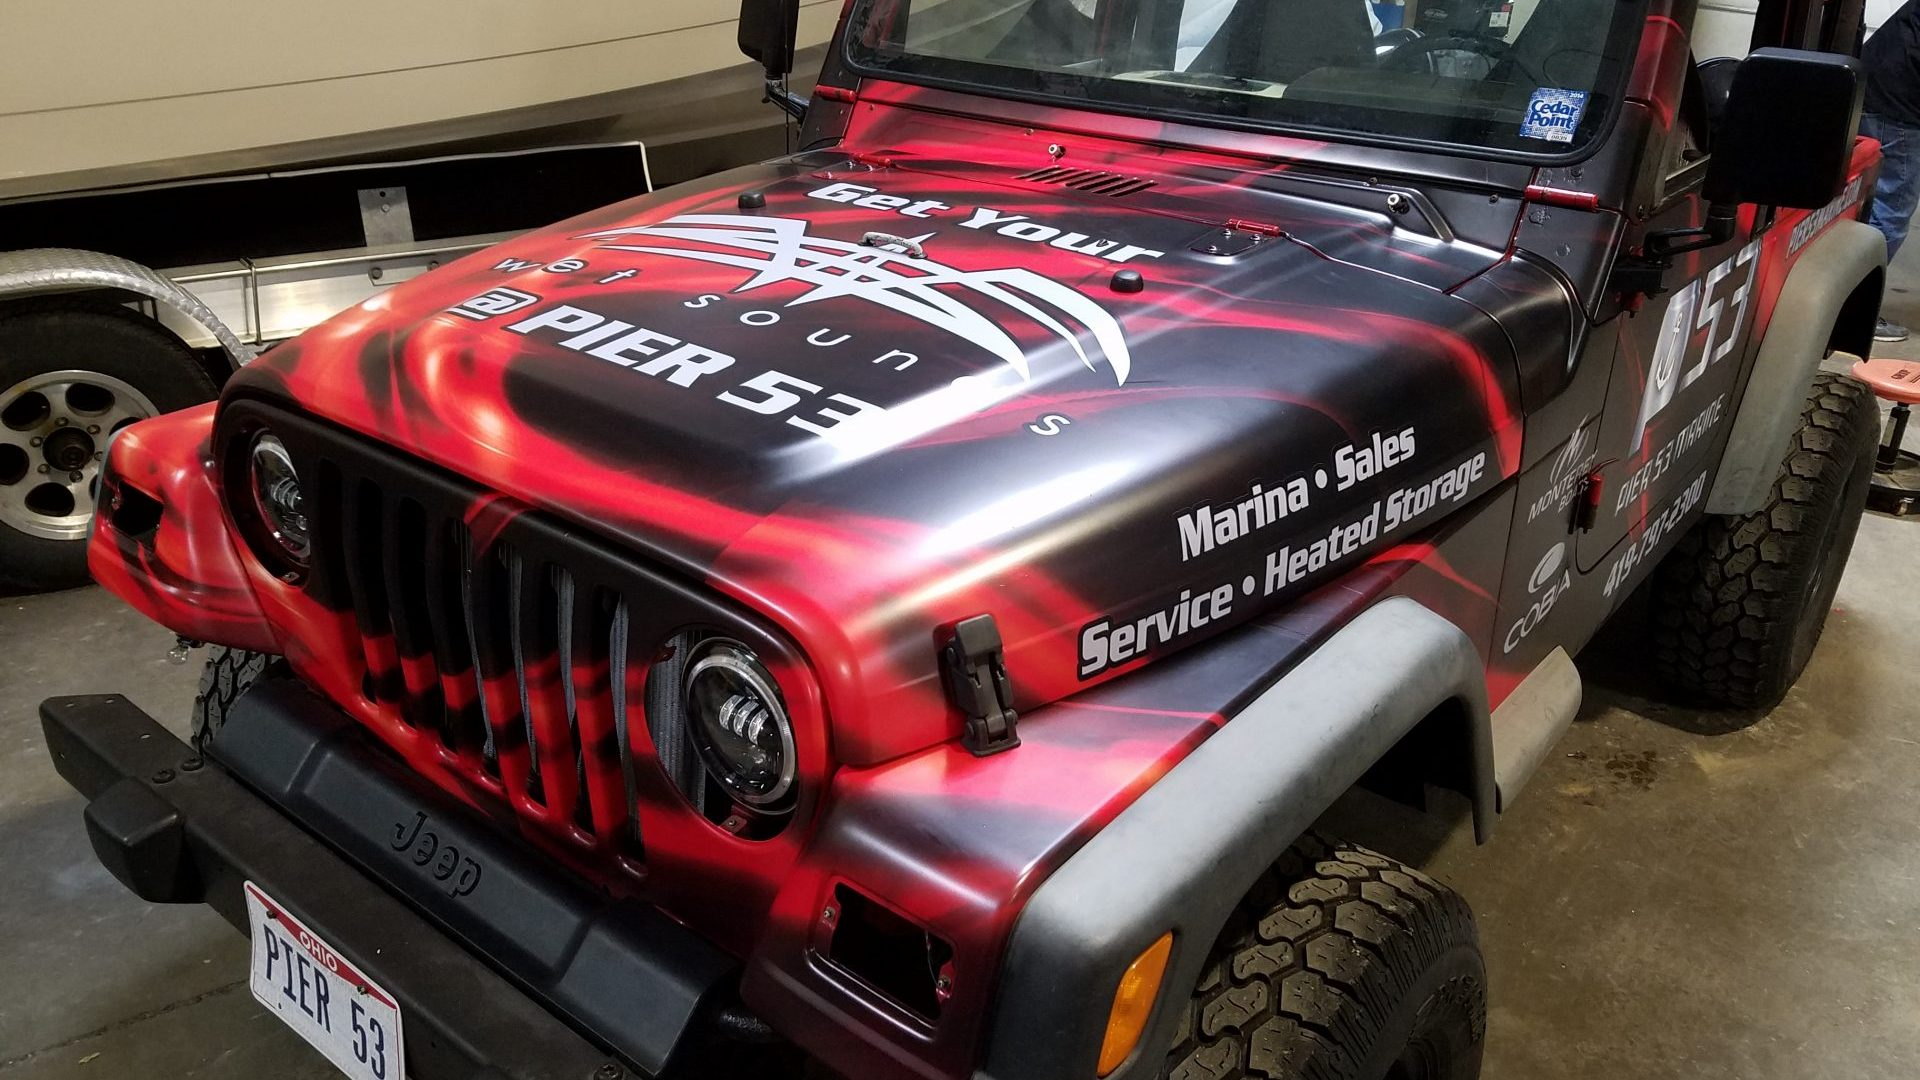 Pier 53 Jeep